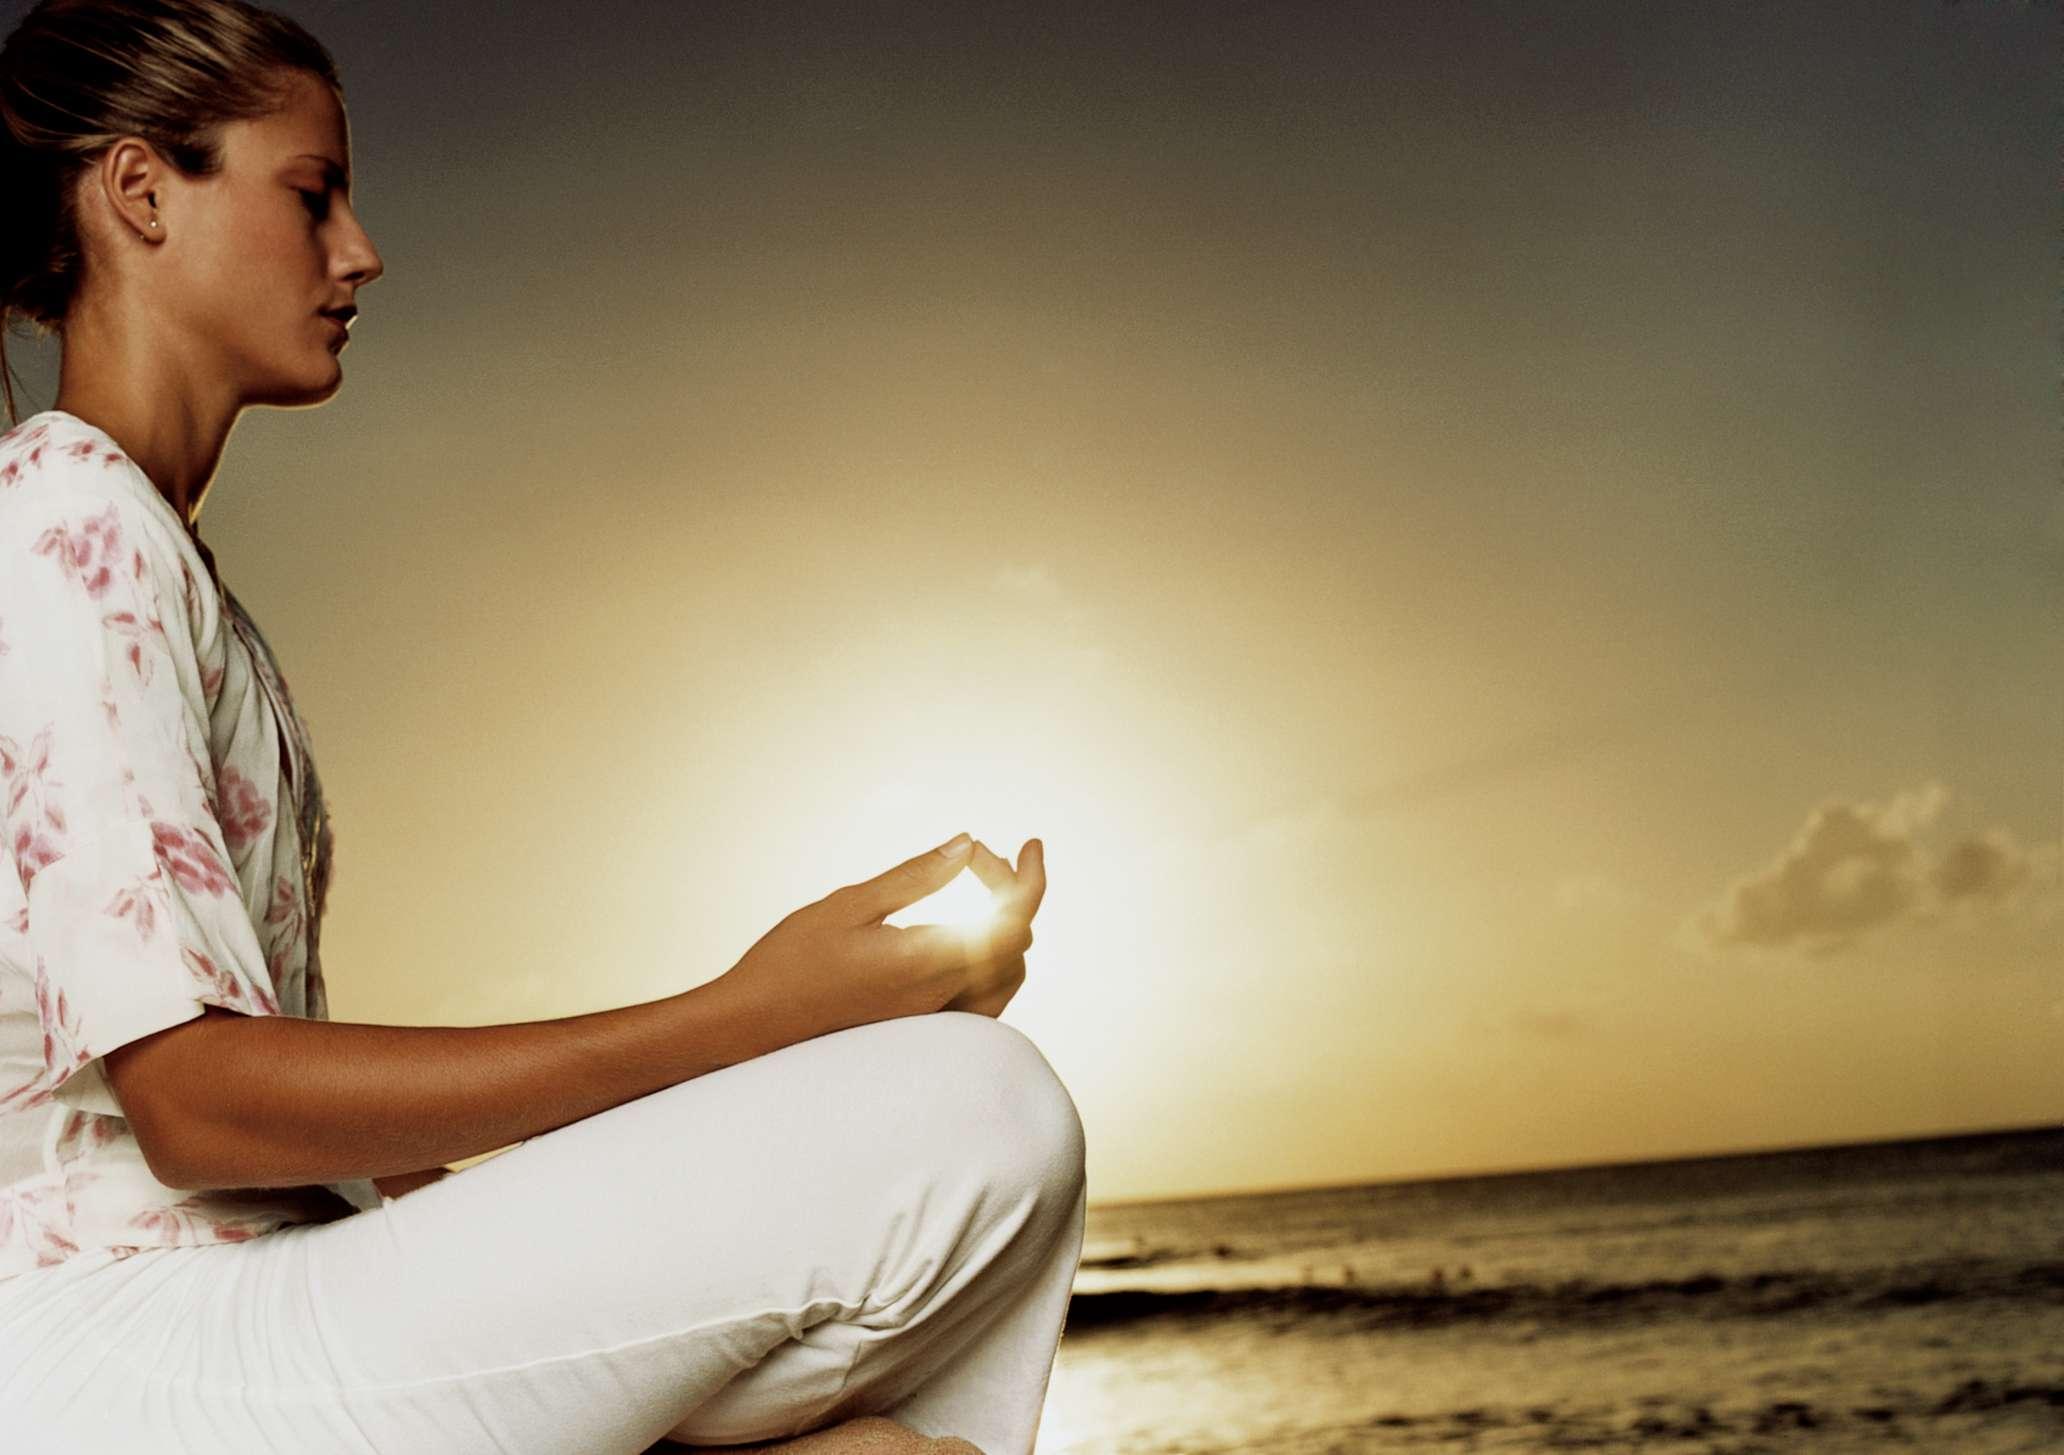 Força espiritual liberta e tranquiliza a alma, diz vidente